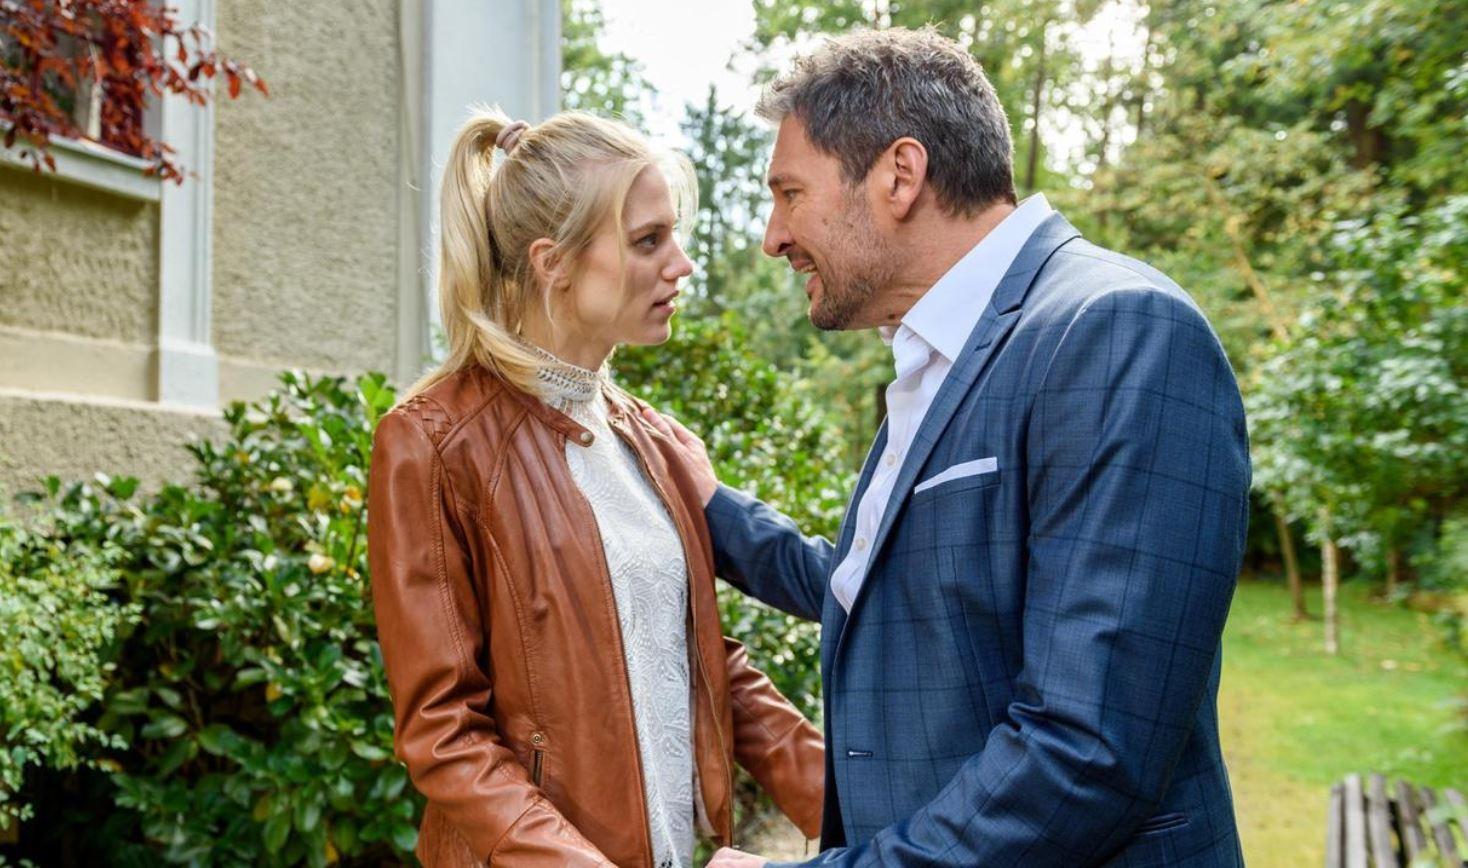 Tempesta d'amore, anticipazioni puntate tedesche: Alicia si allontana da Christoph e… sogna Viktor!